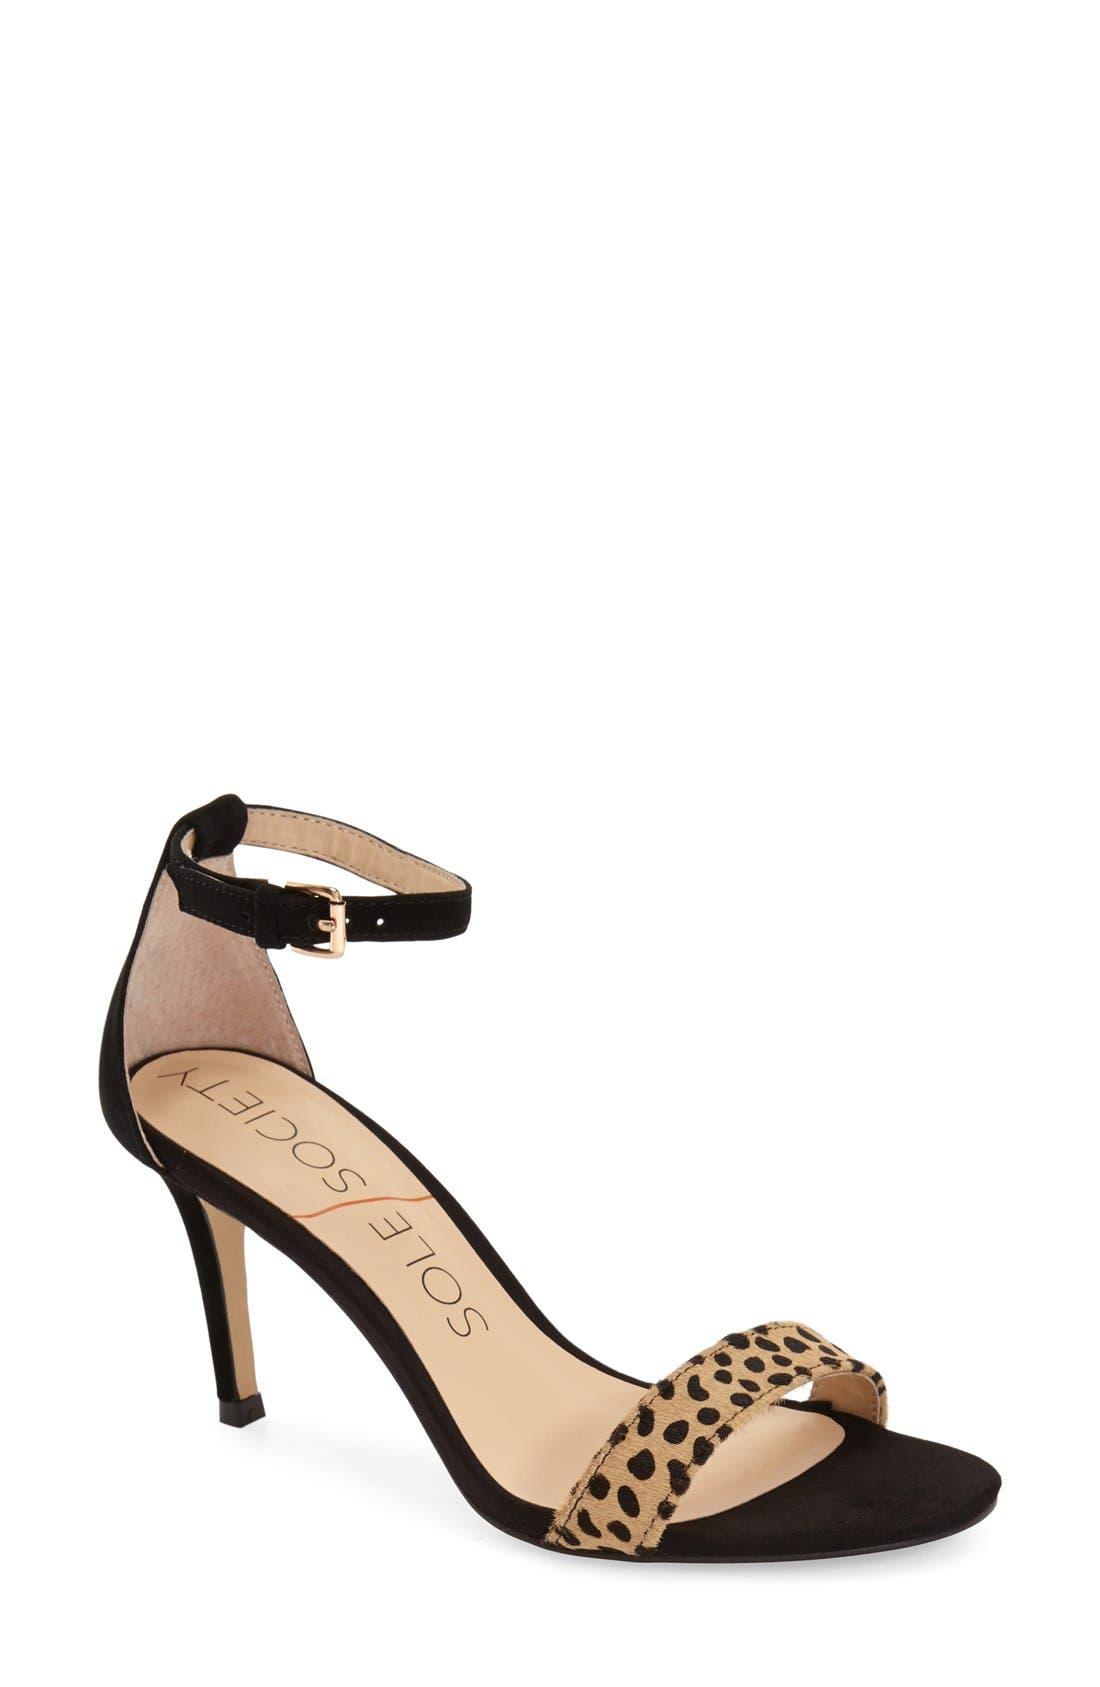 Main Image - Sole Society 'Dace' Sandal (Women)